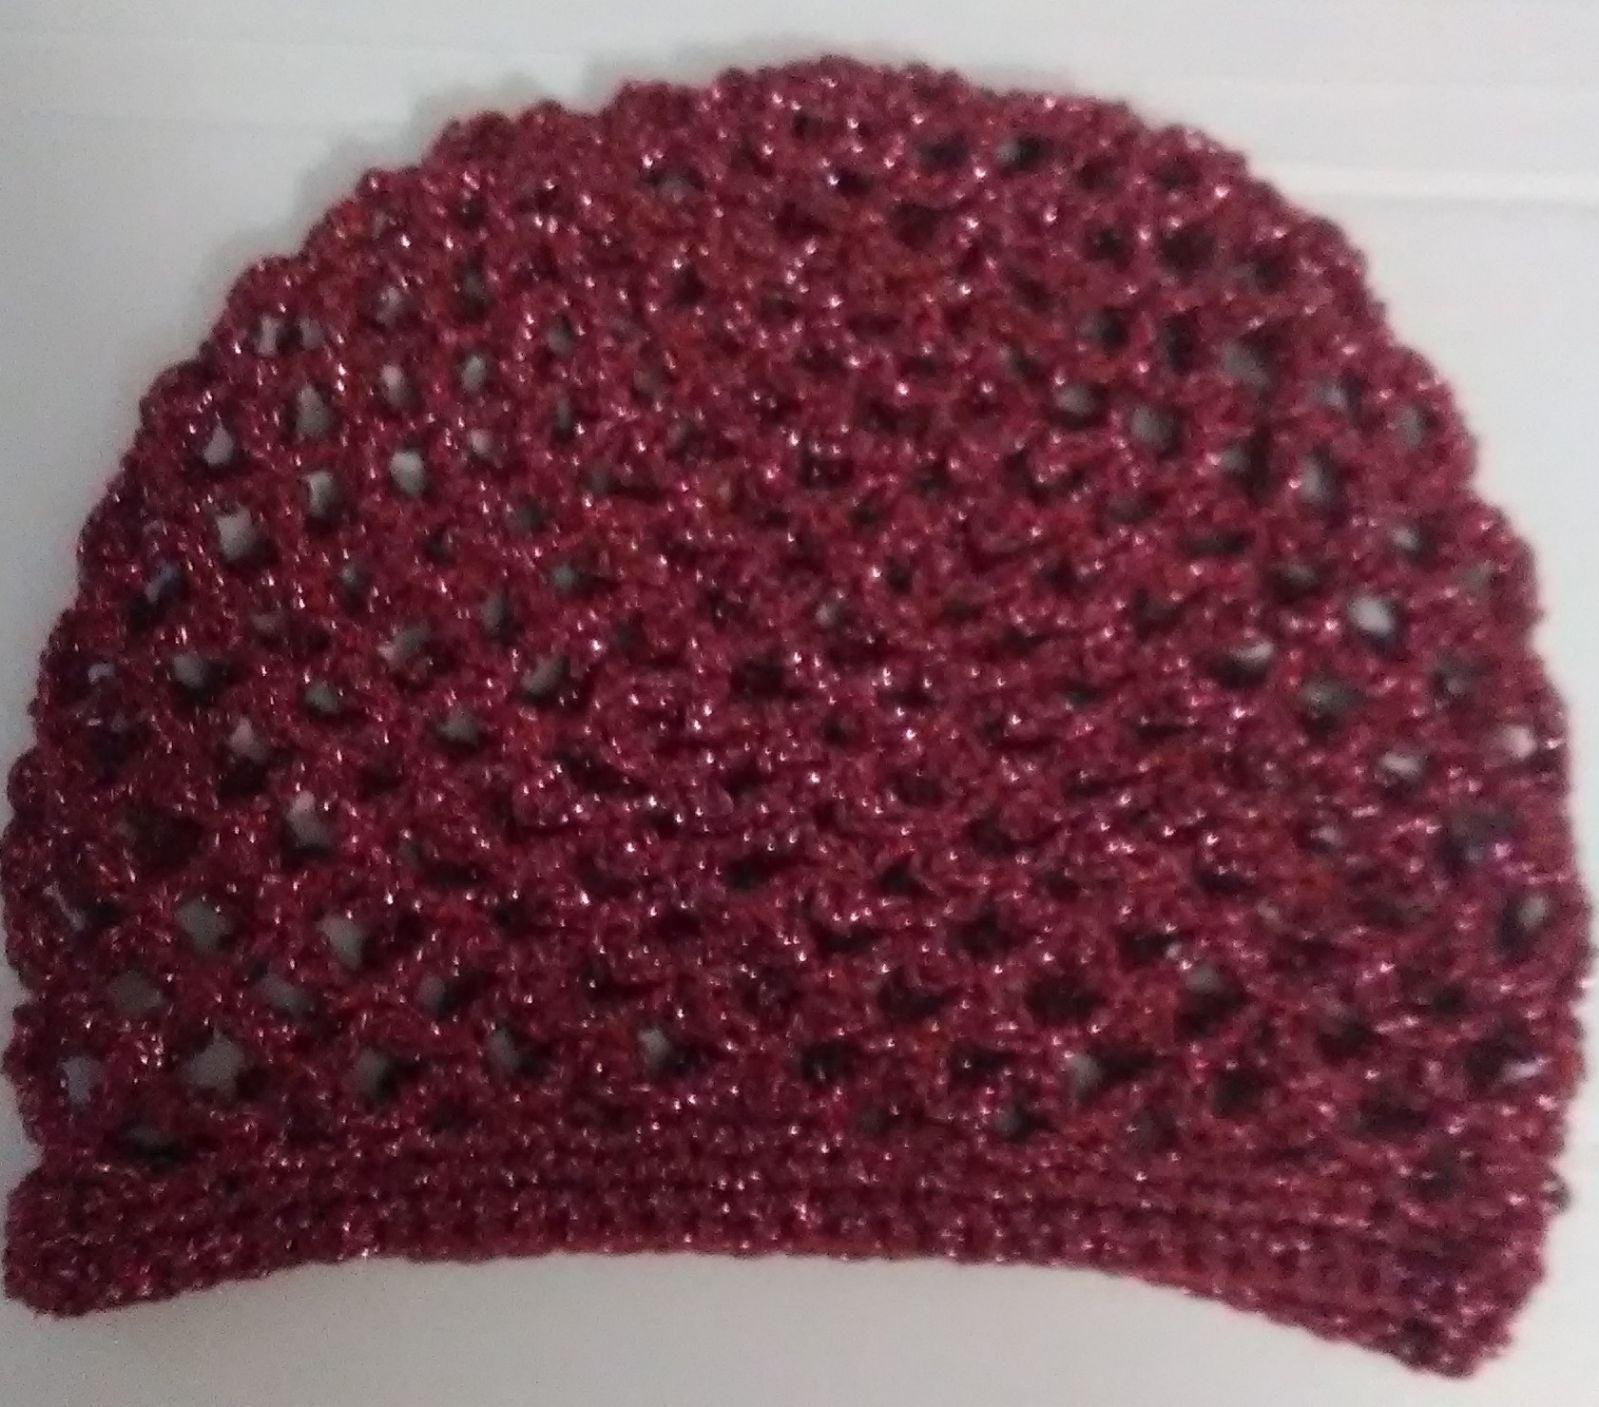 Ruby red juliette cap, mesh crochet